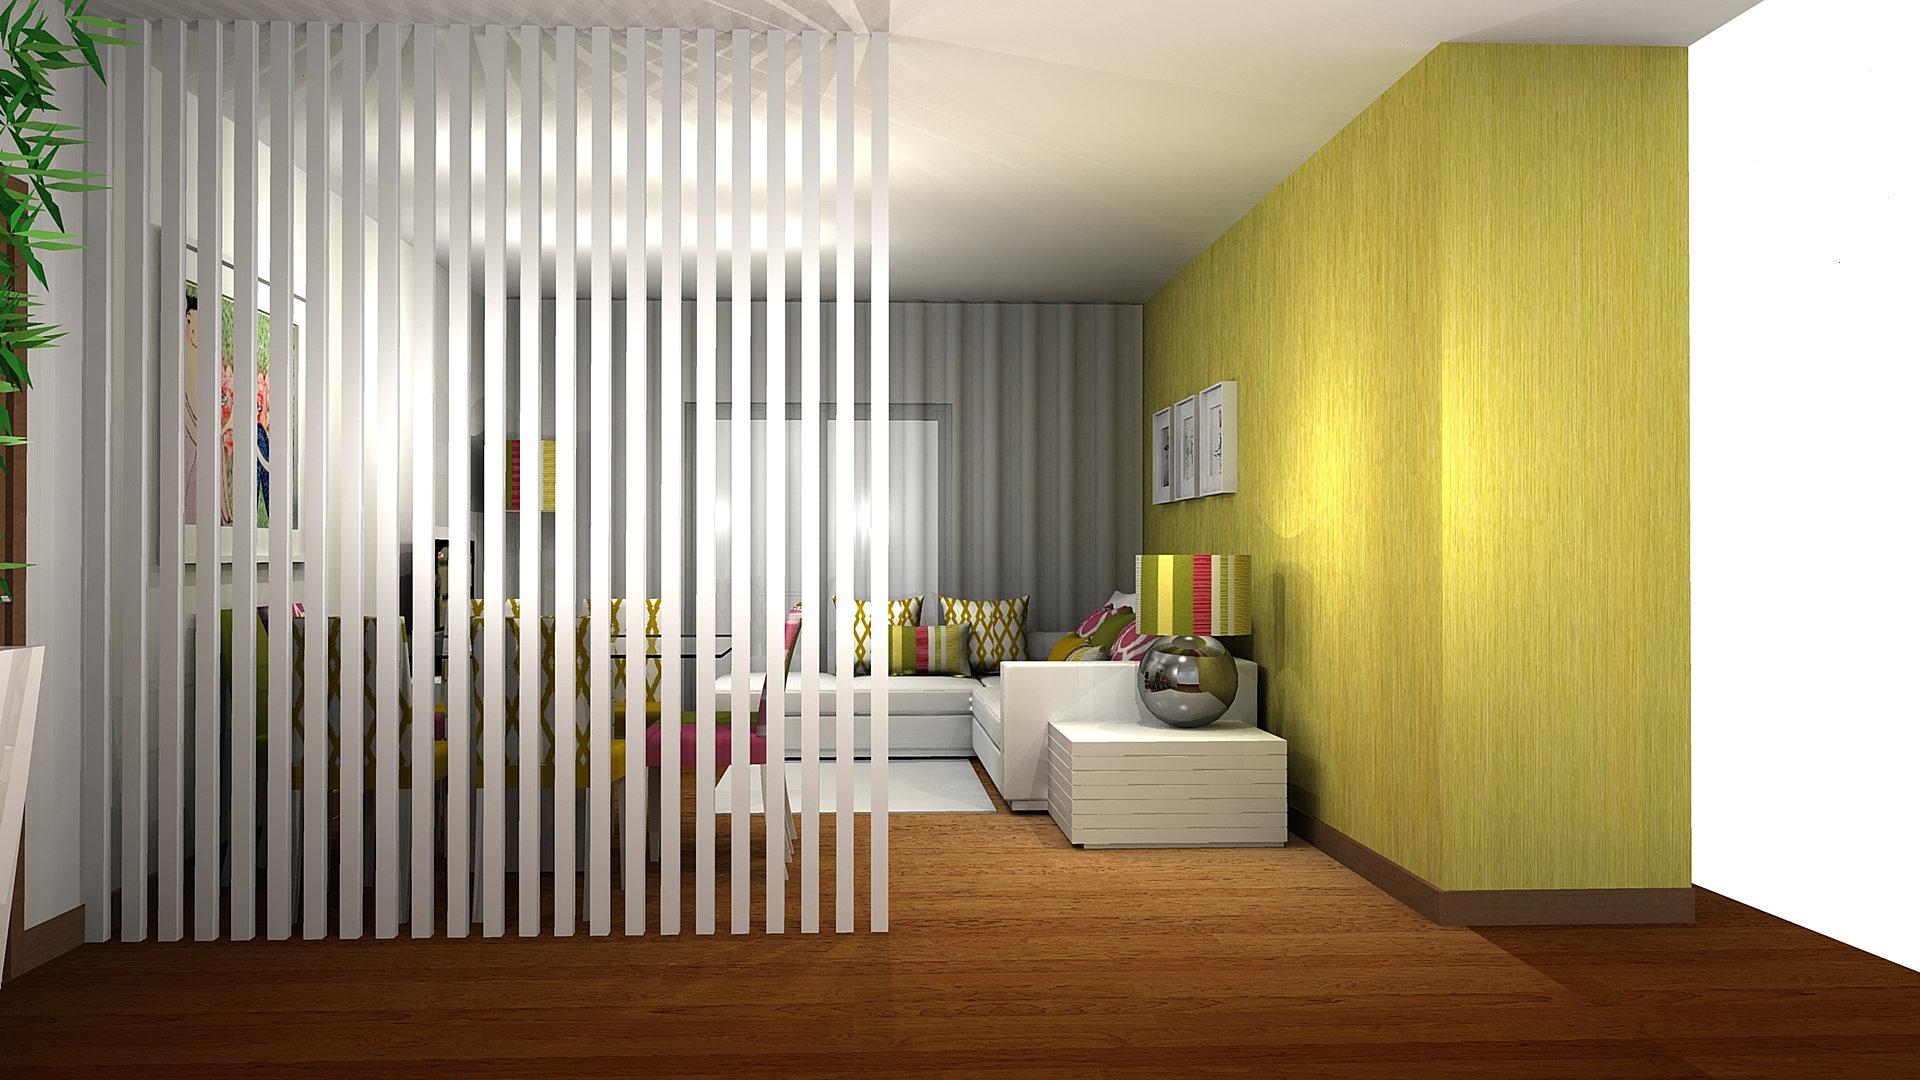 Sala De Estar Arquitectura ~ Sara Amorim Faria Arquitectura Design Interiores  sala de estar